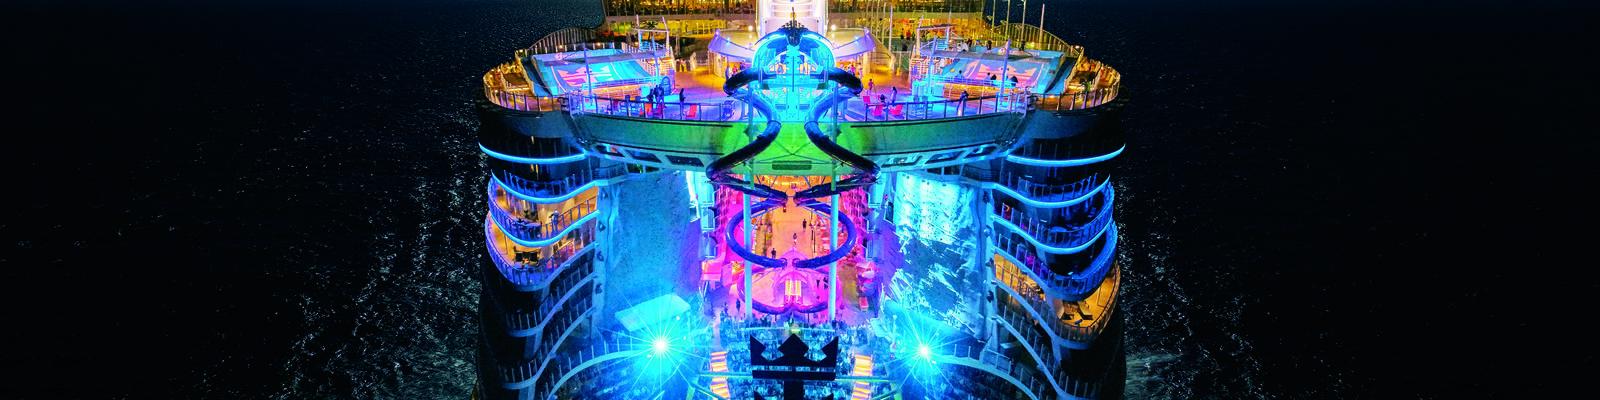 Symphony Of The Seas Videos Cruise Critic